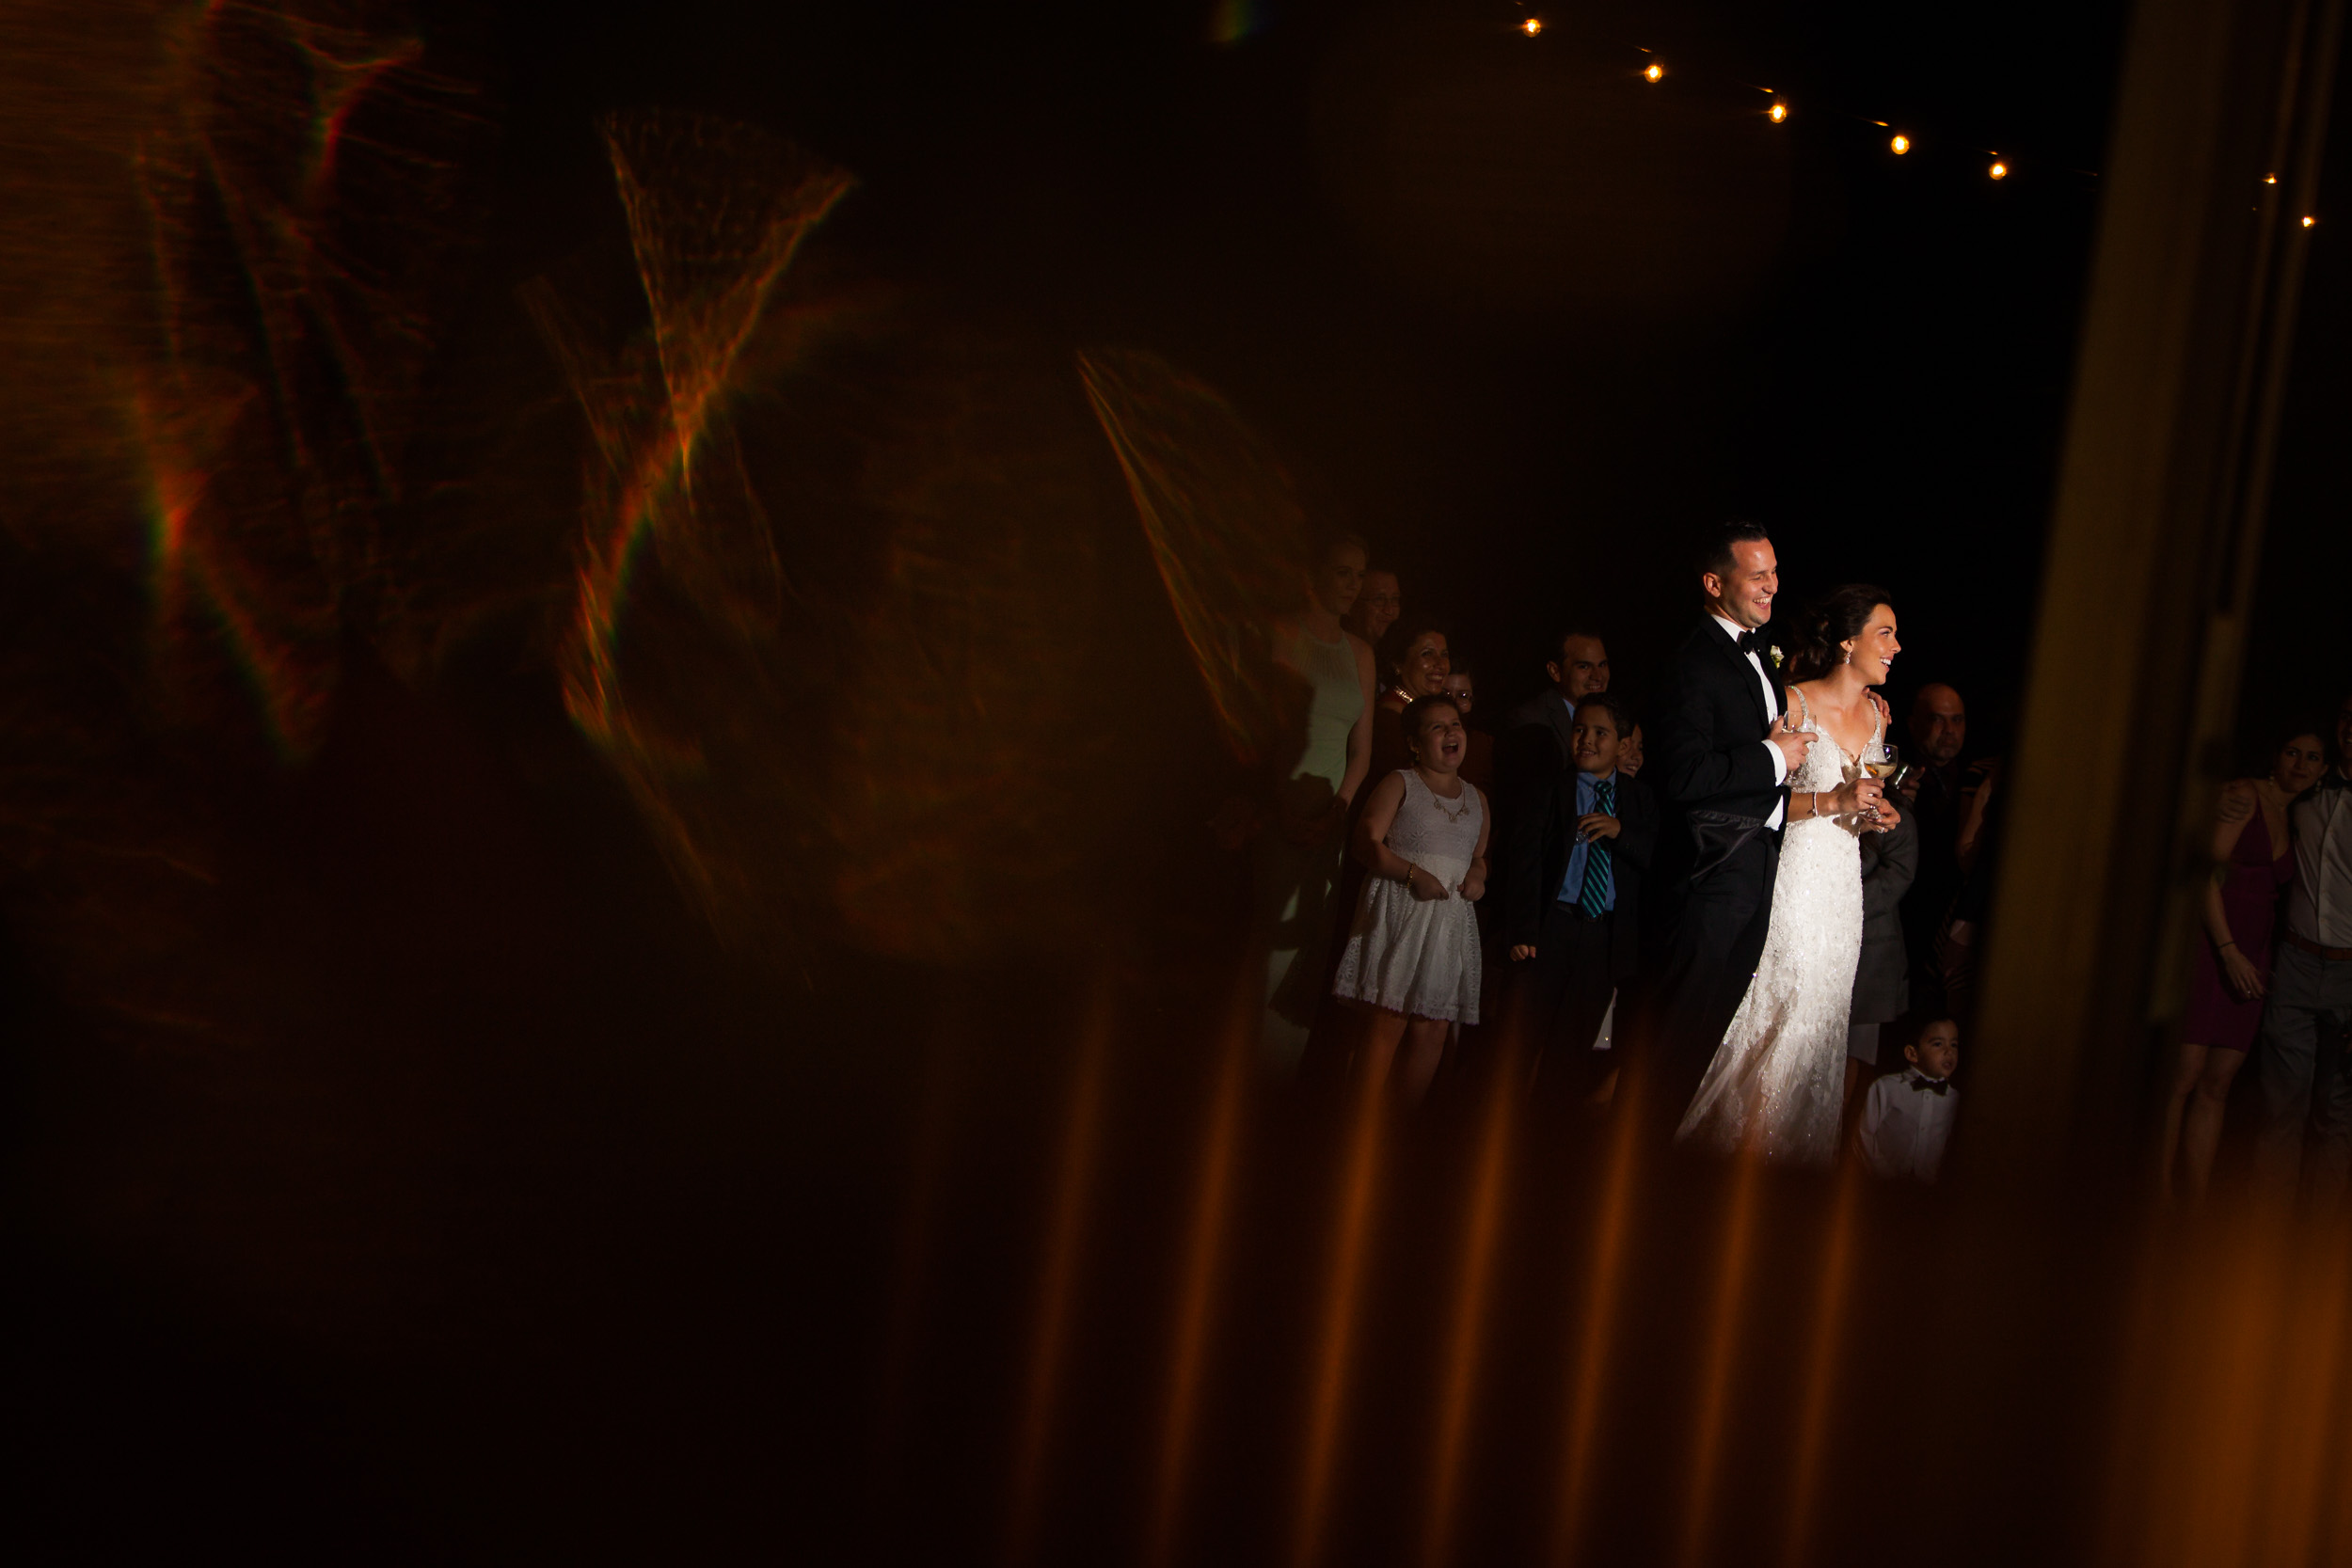 Flordia-Wedding-Photography-64.jpg